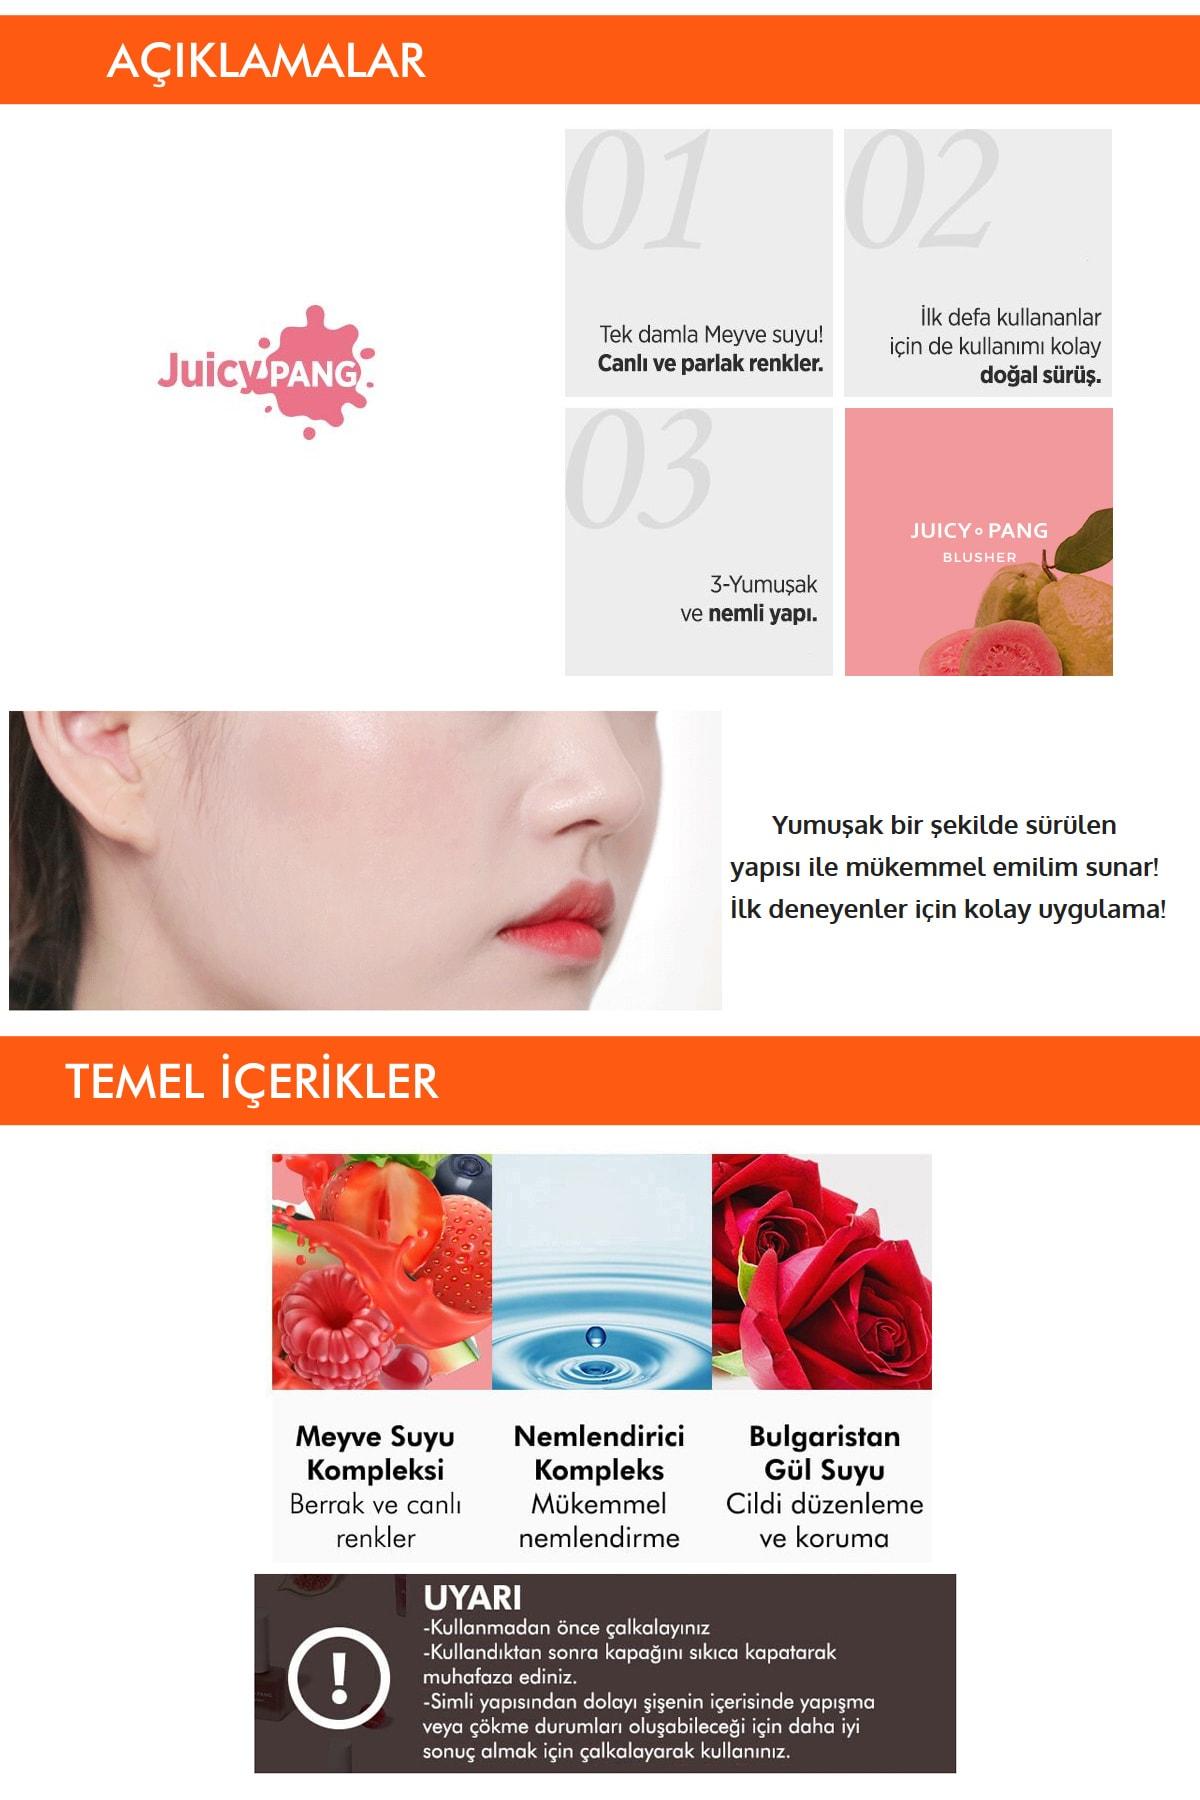 Missha Doğal Görünüm Sunan Nemlendirici Likit Allık 9g. APIEU Juicy-Pang Water Blusher (PK03) 3